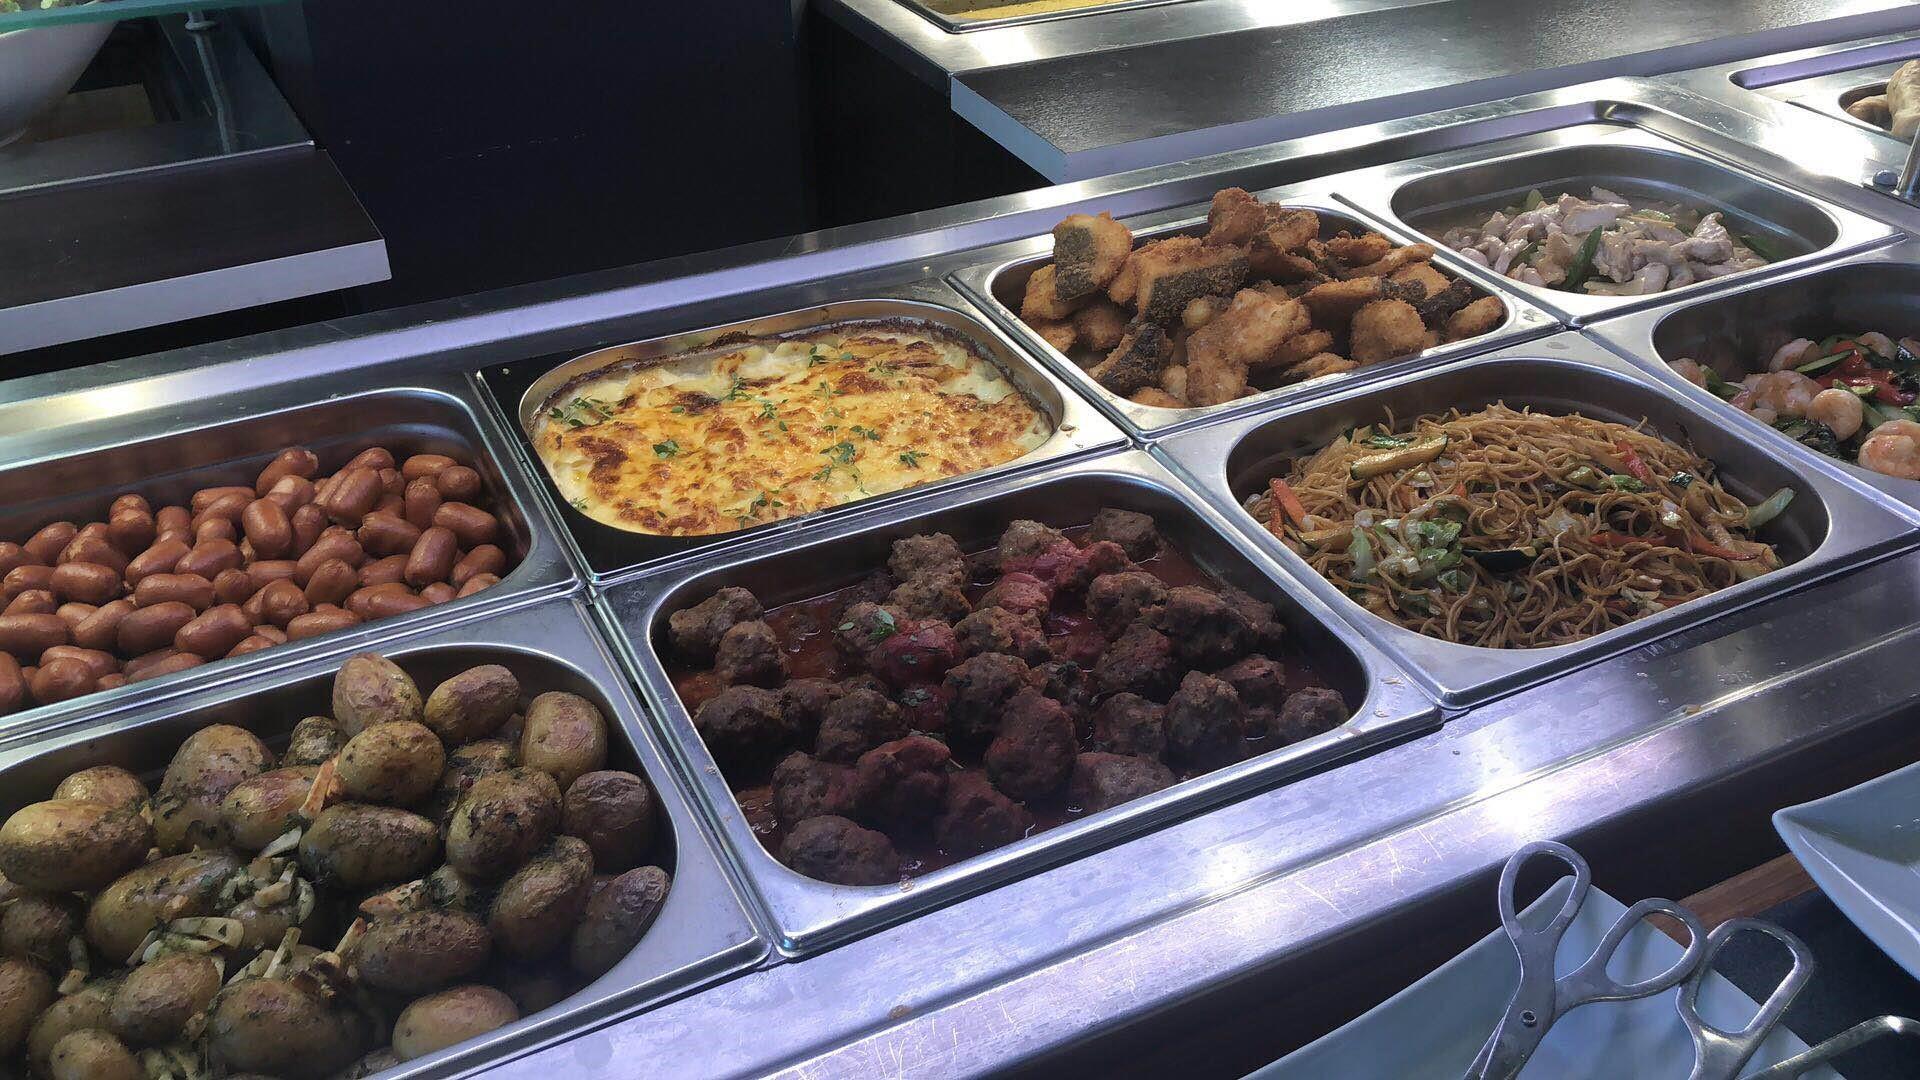 Malin-sogndal-buffet-1.jpg